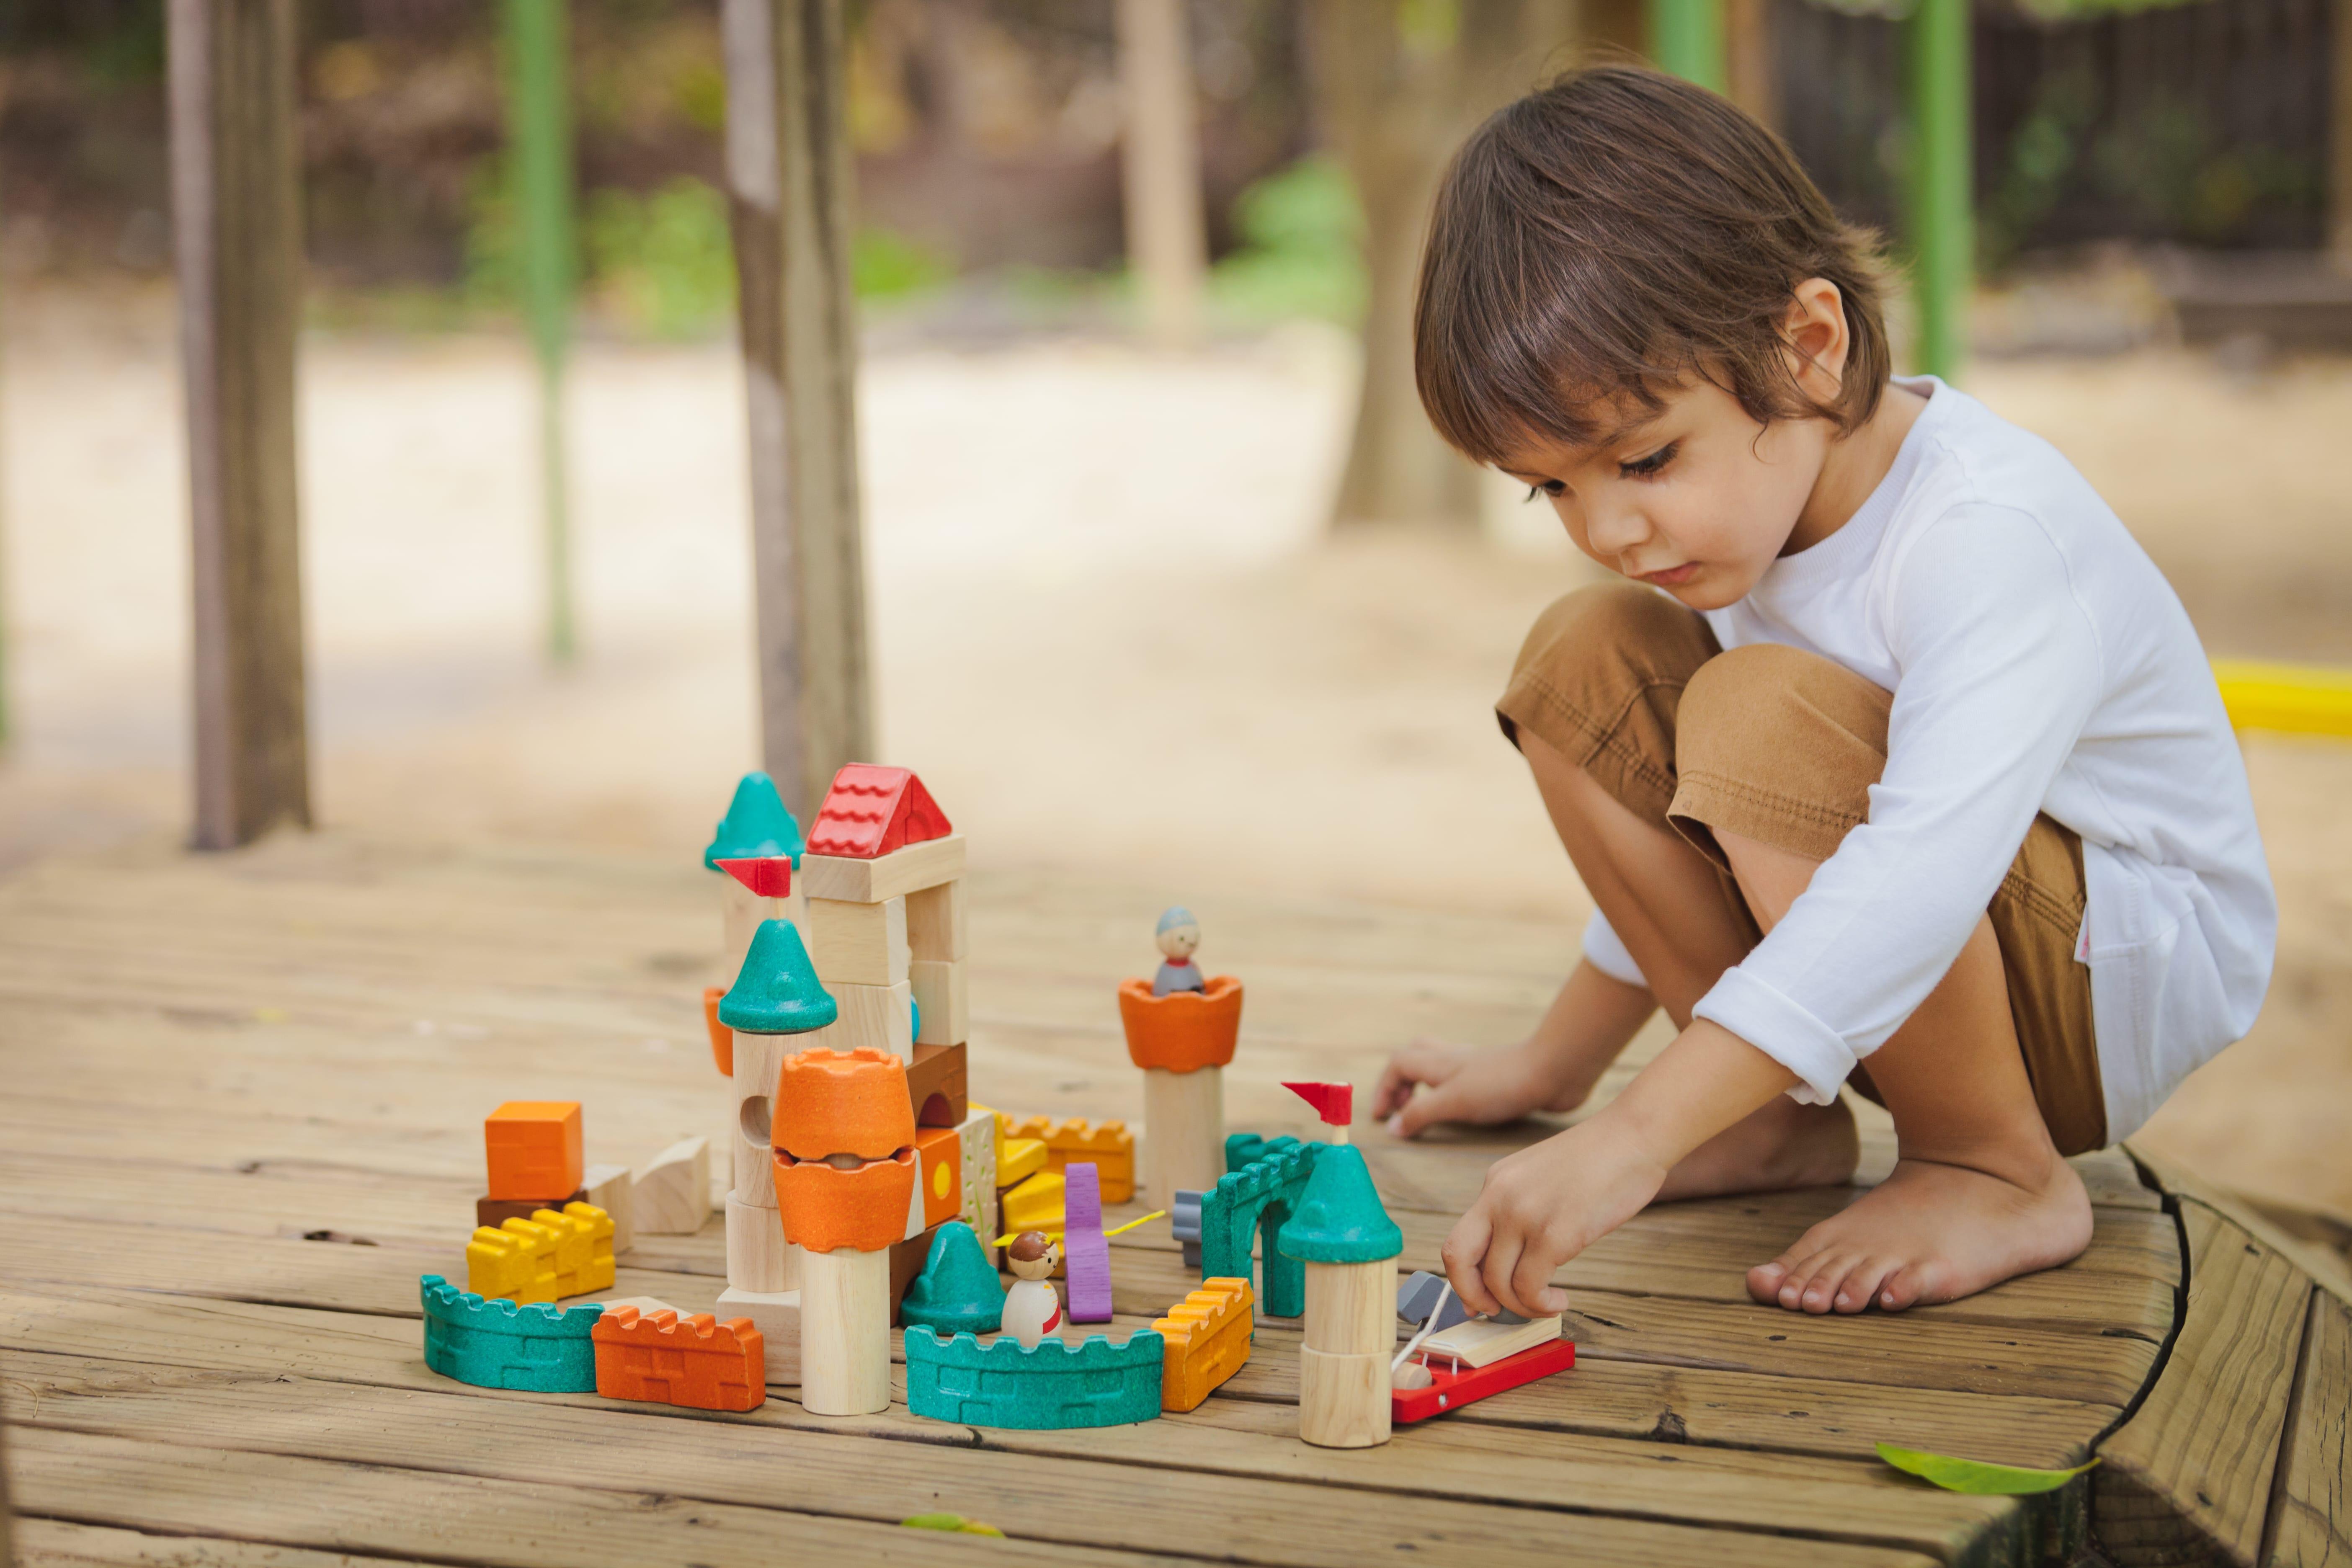 5696_PlanToys_FANTASY_BLOCKS_Blocks_and_Construction_Fine_Motor_Coordination_Creative_Tactile_3yrs_Wooden_toys_Education_toys_Safety_Toys_Non-toxic_1.jpg